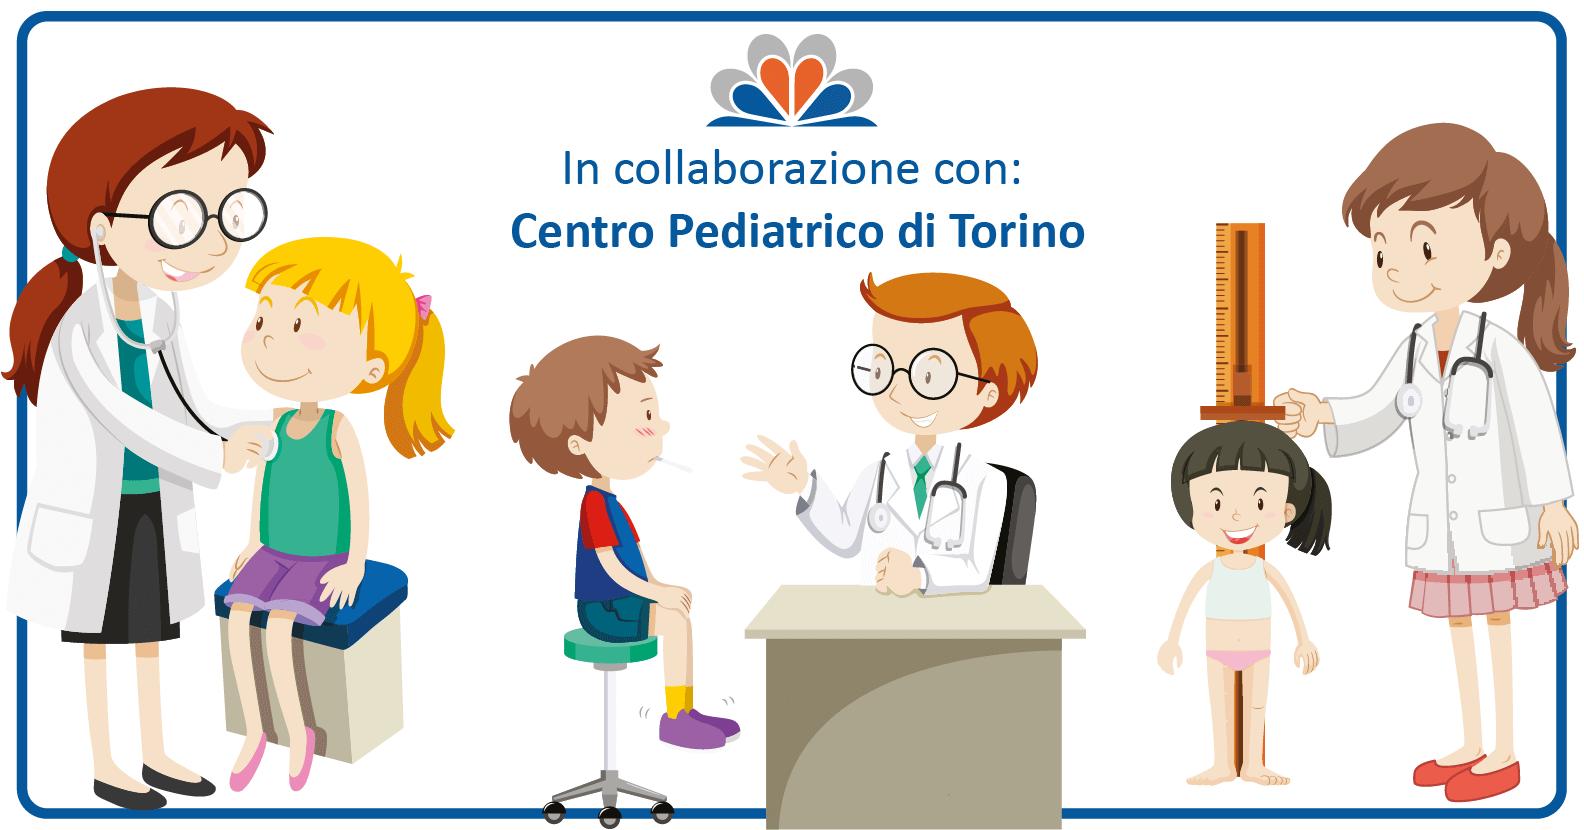 visite pediatriche gratuite a Melfi, screening fasif per dipendenti fca